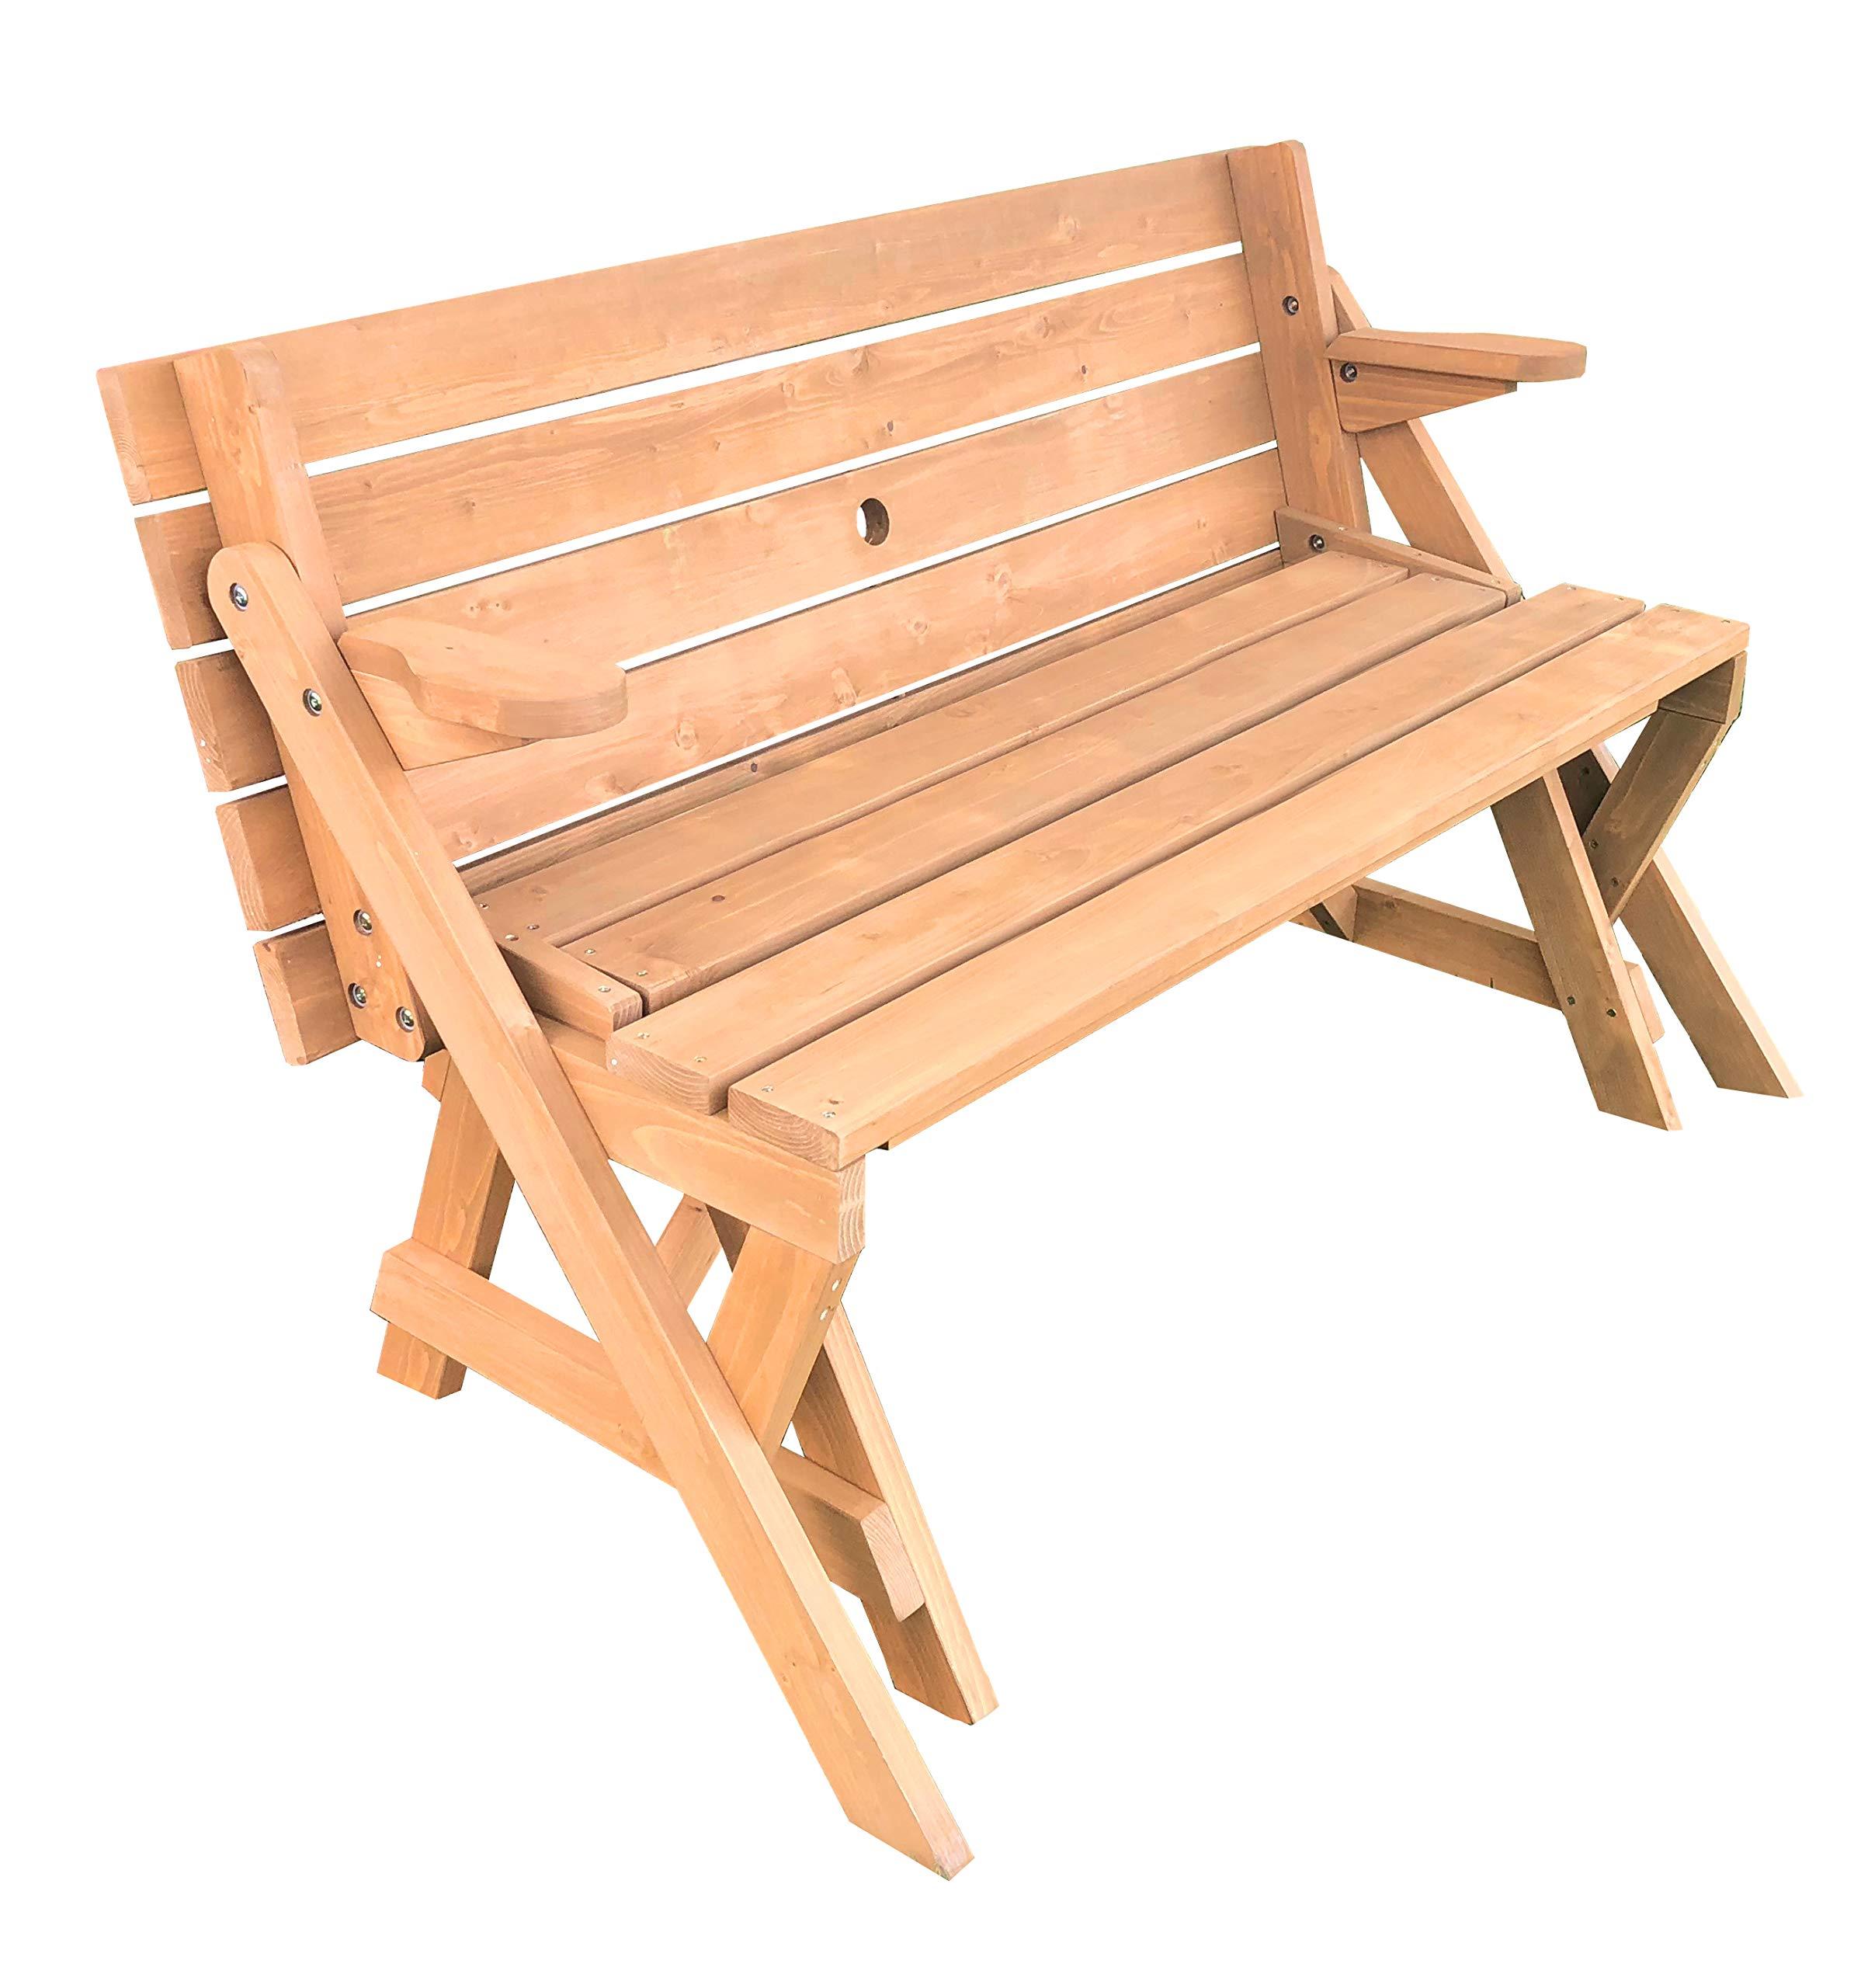 Tierra Garden 2-in-1 Convertible Junior Picnic Table/Bench by Tierra Garden (Image #2)